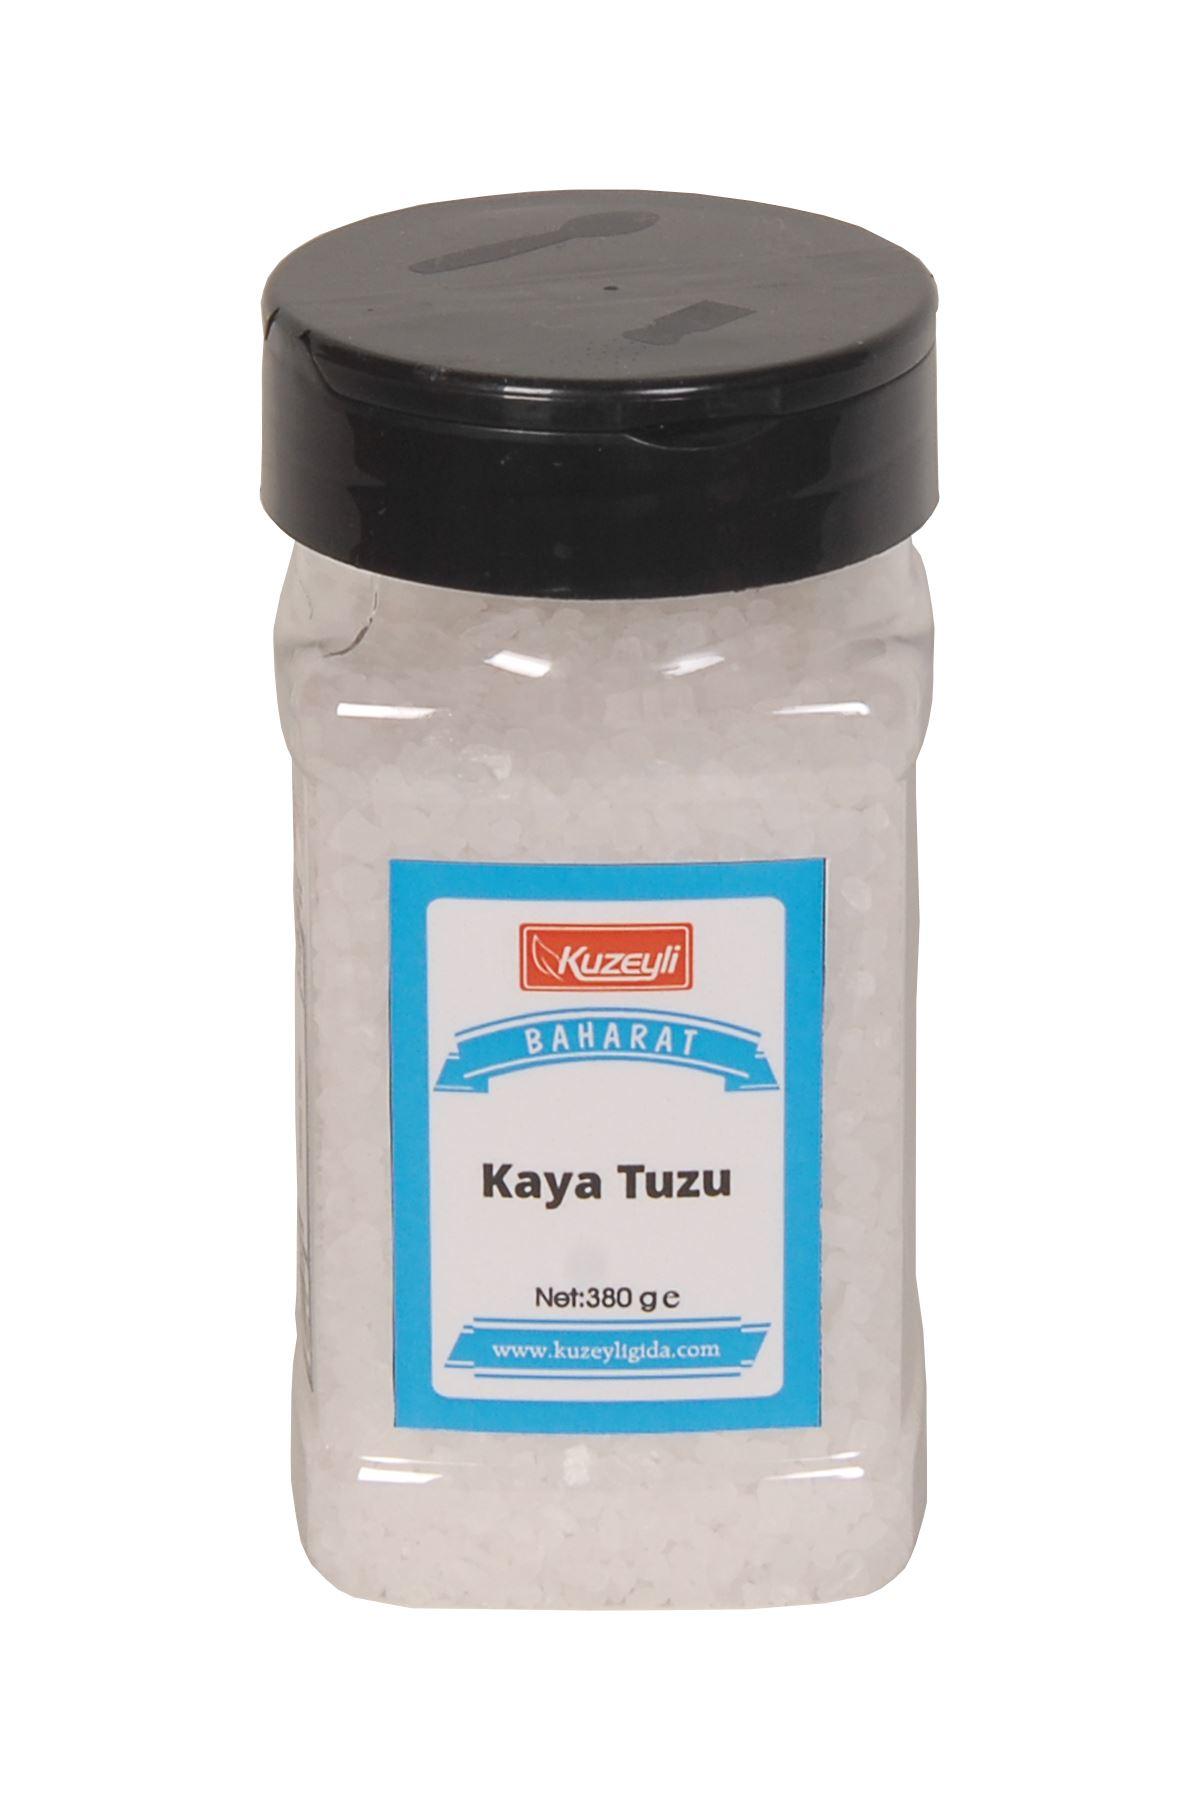 Kaya Tuzu 380 G